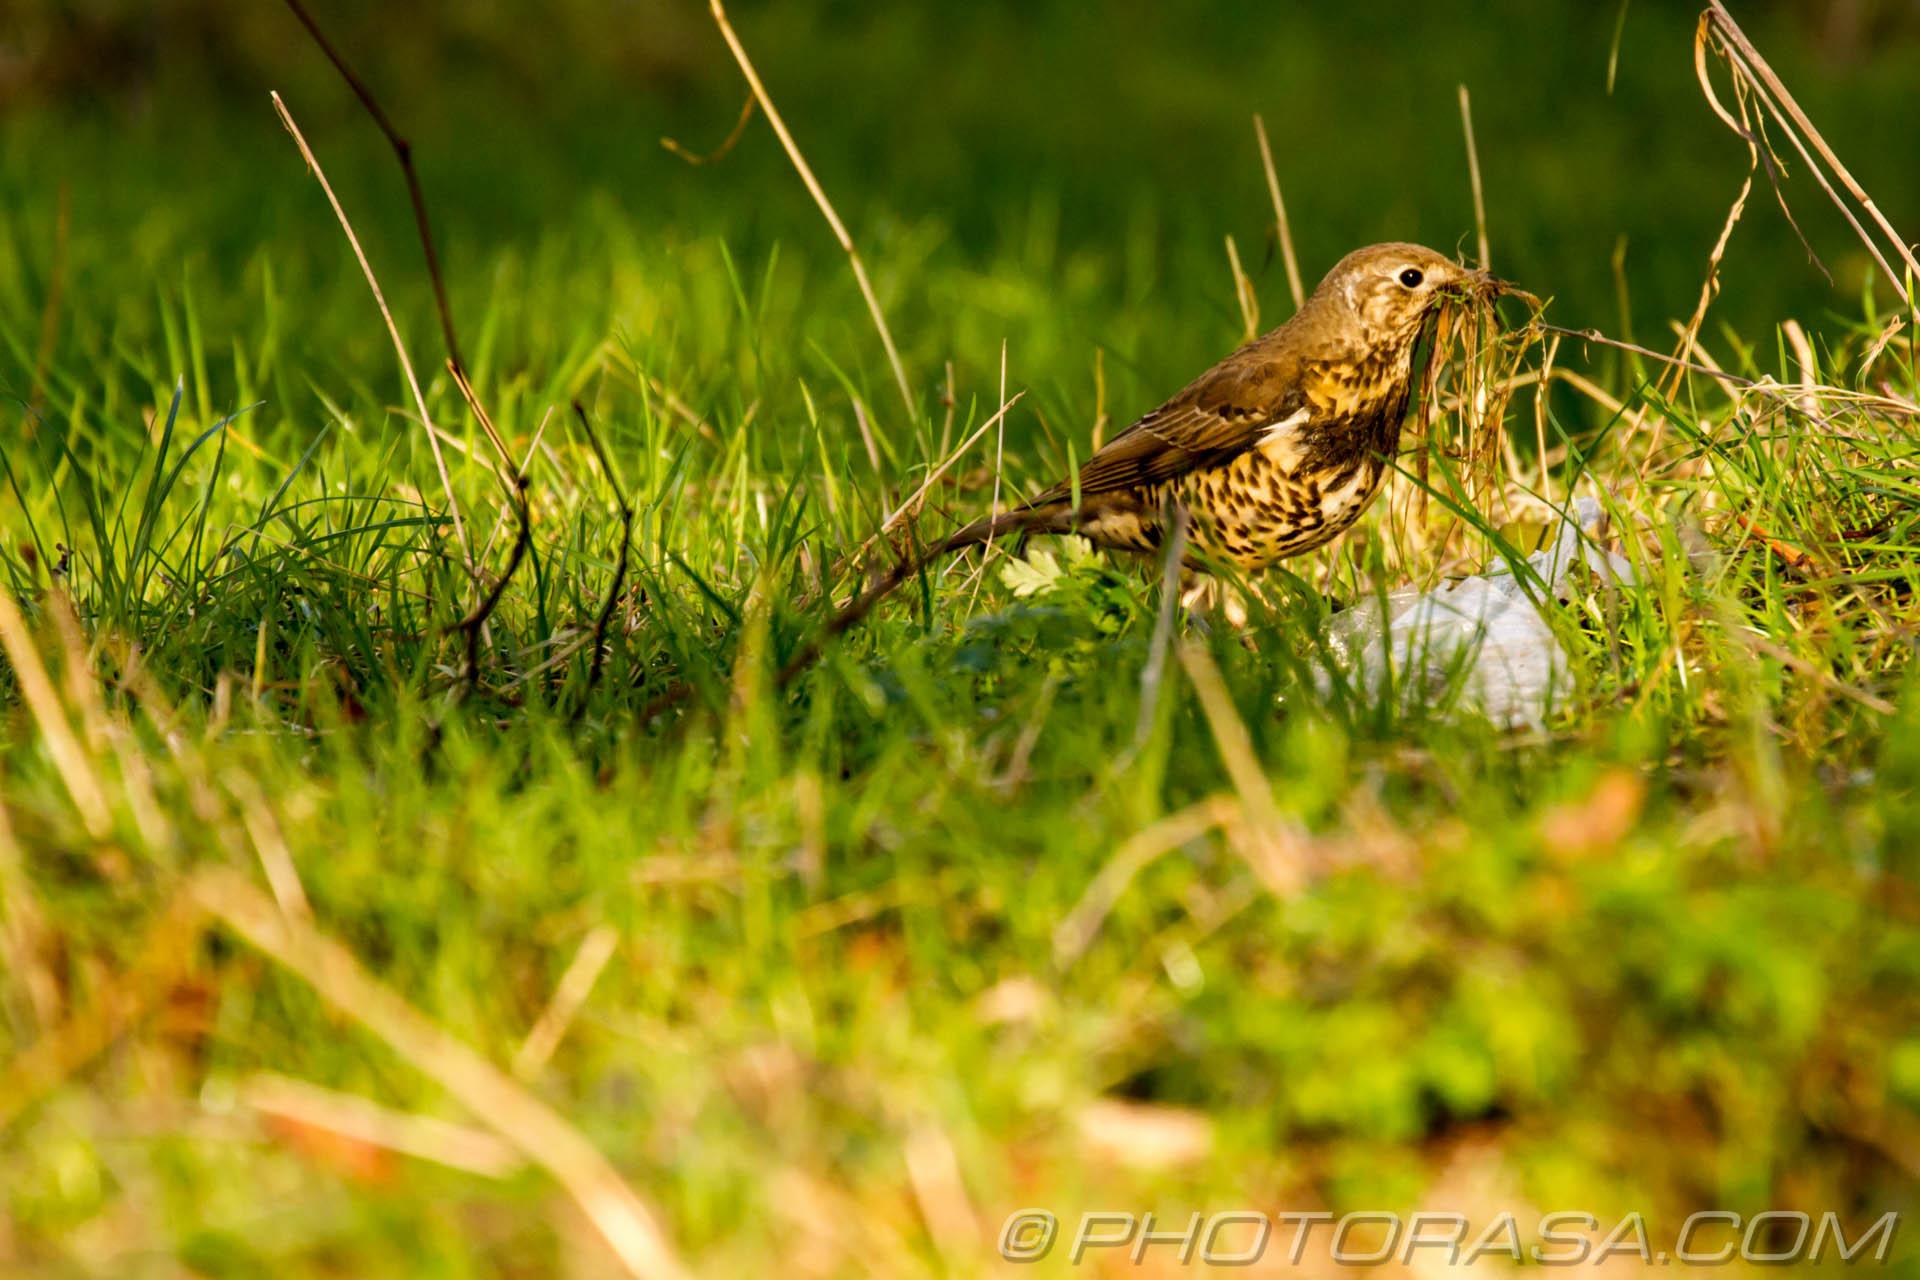 http://photorasa.com/mistle-thrush-scavenging-nest-materials/in-long-grass-looking-around/